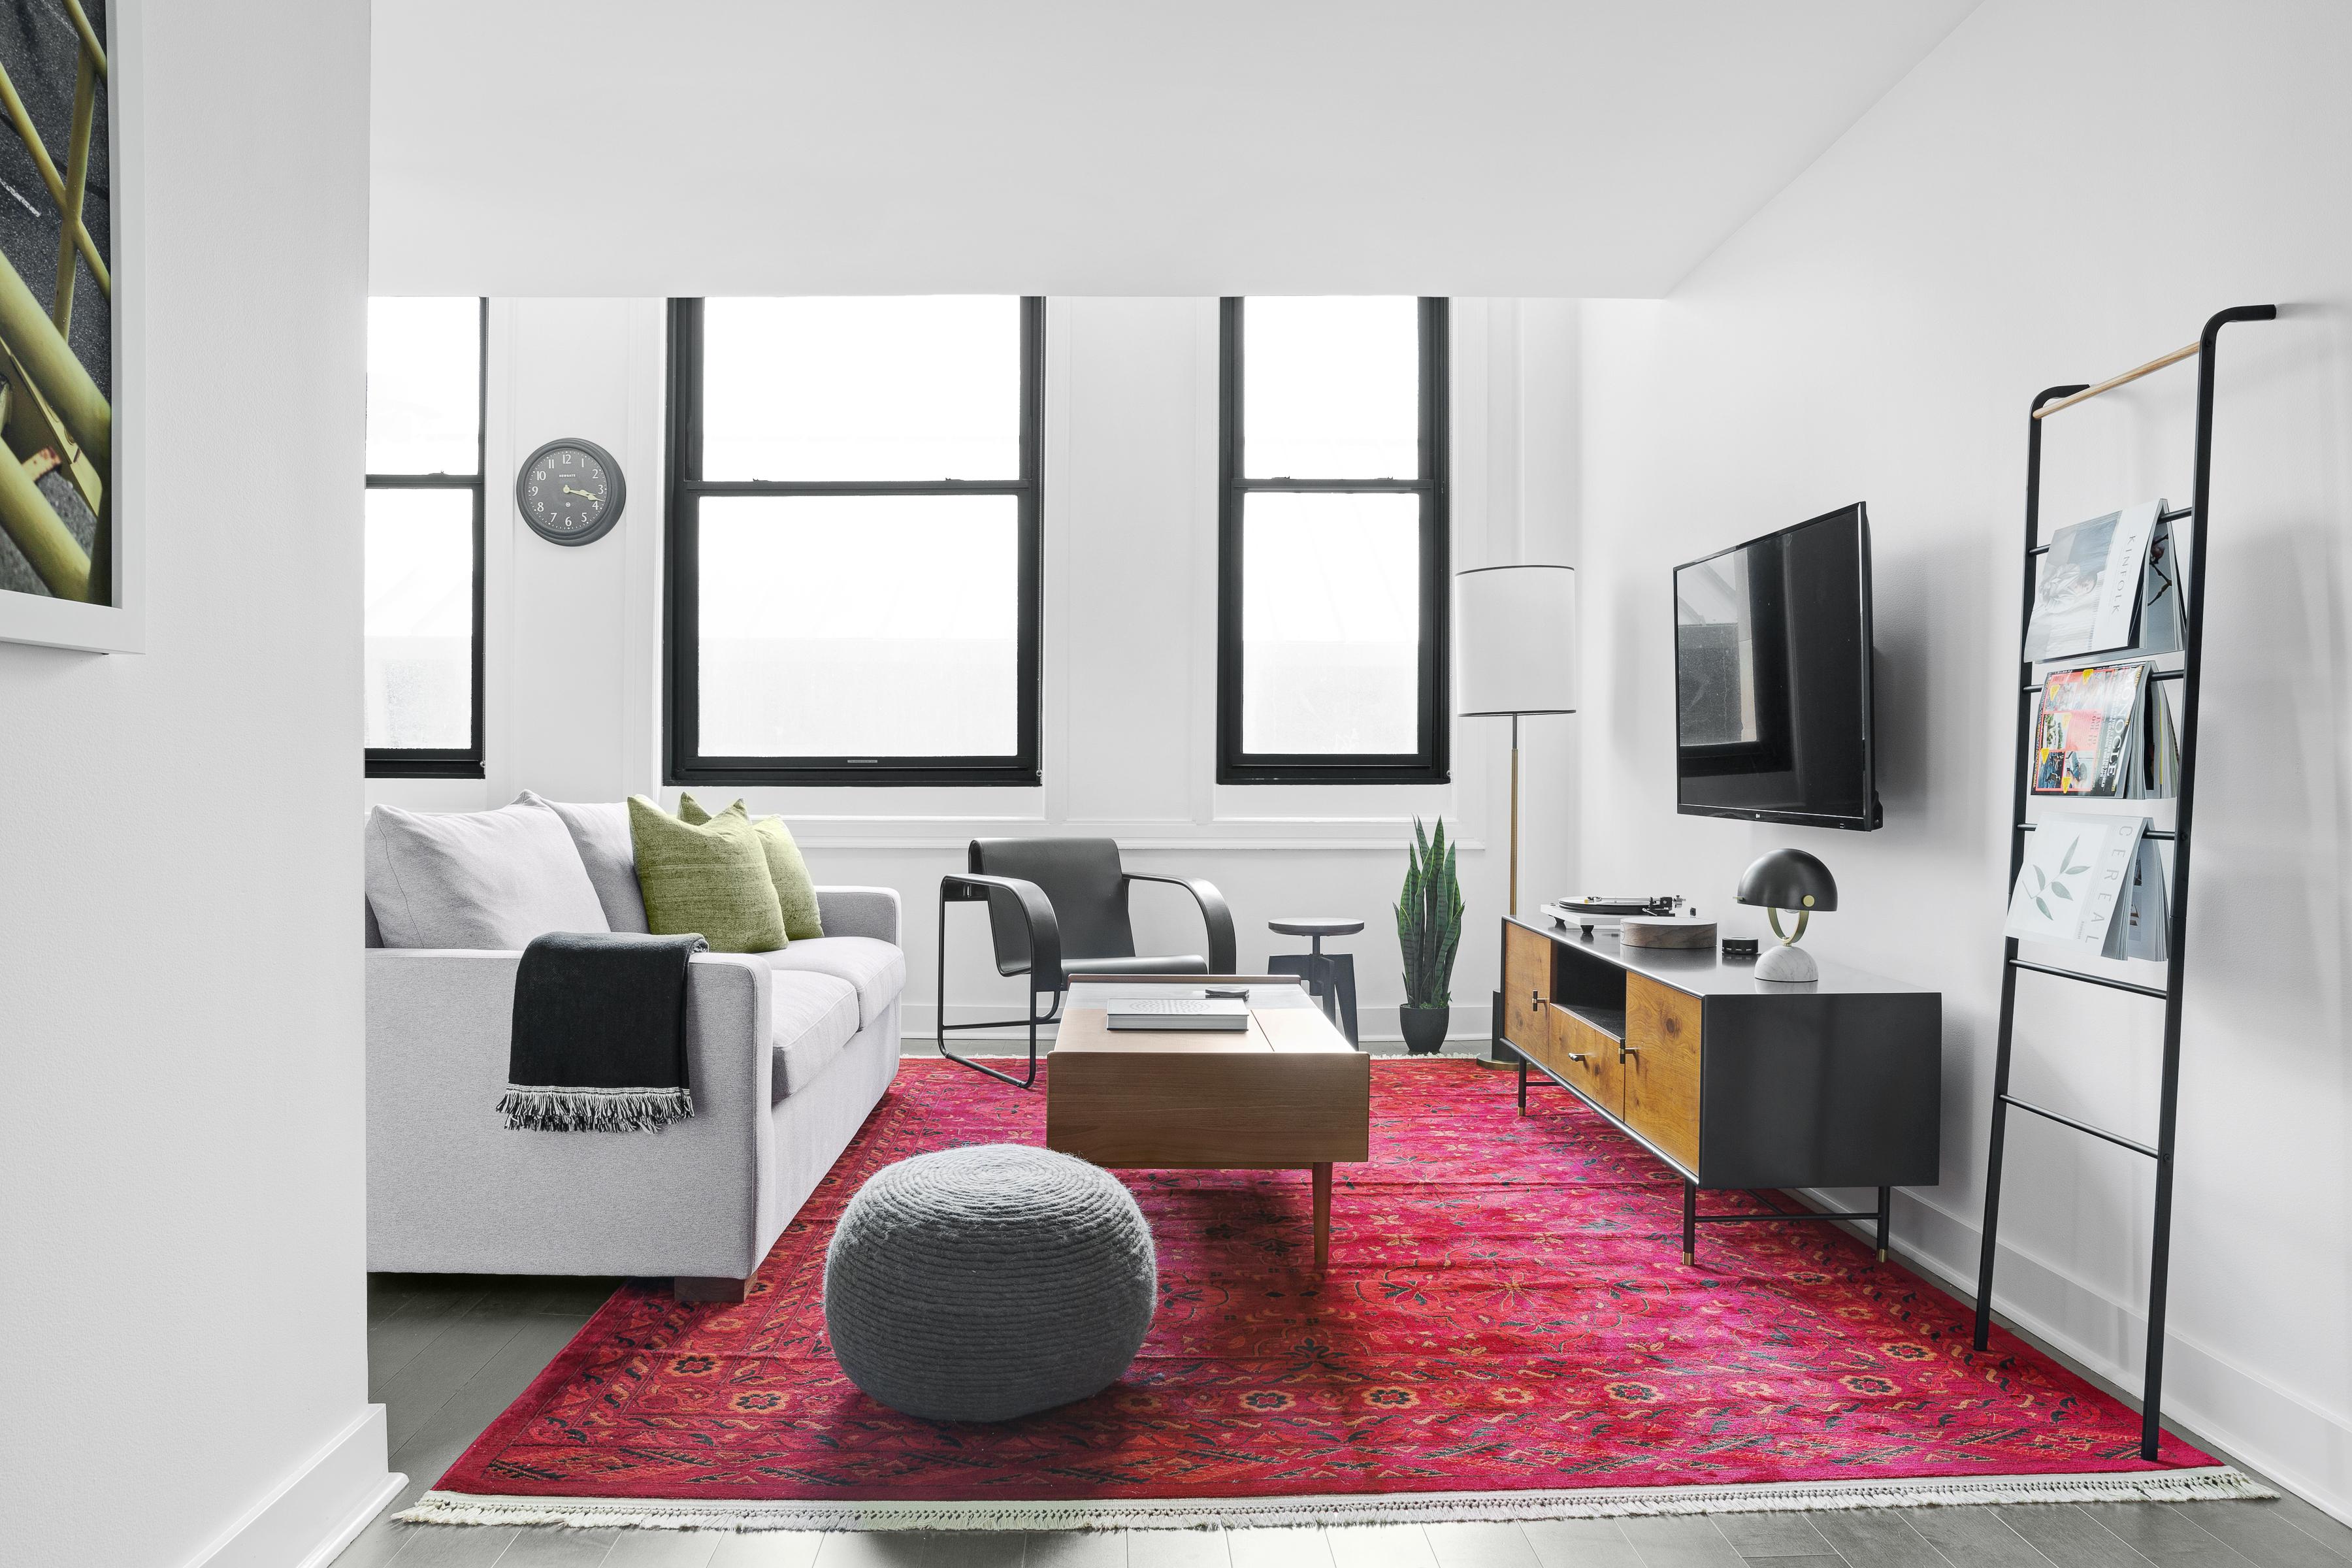 airbnb lyric investment